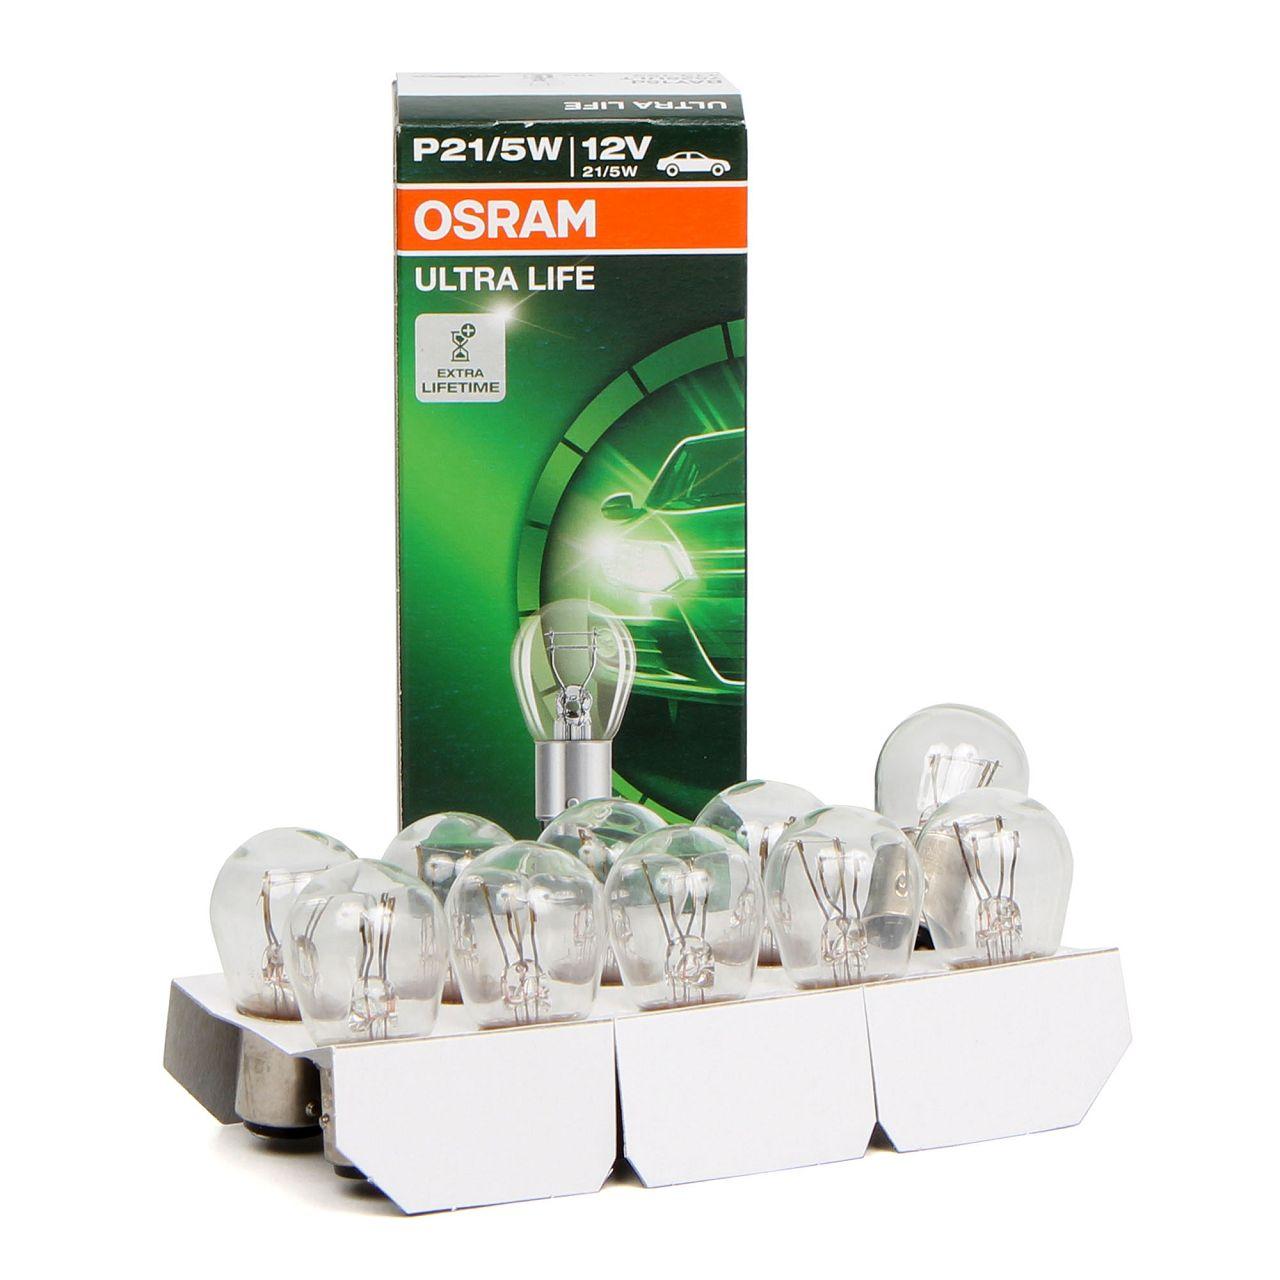 10x OSRAM Kugellampe Stecksockel P21/5W ULTRA LIFE 12V 21/5W BAY15d 7528ULT